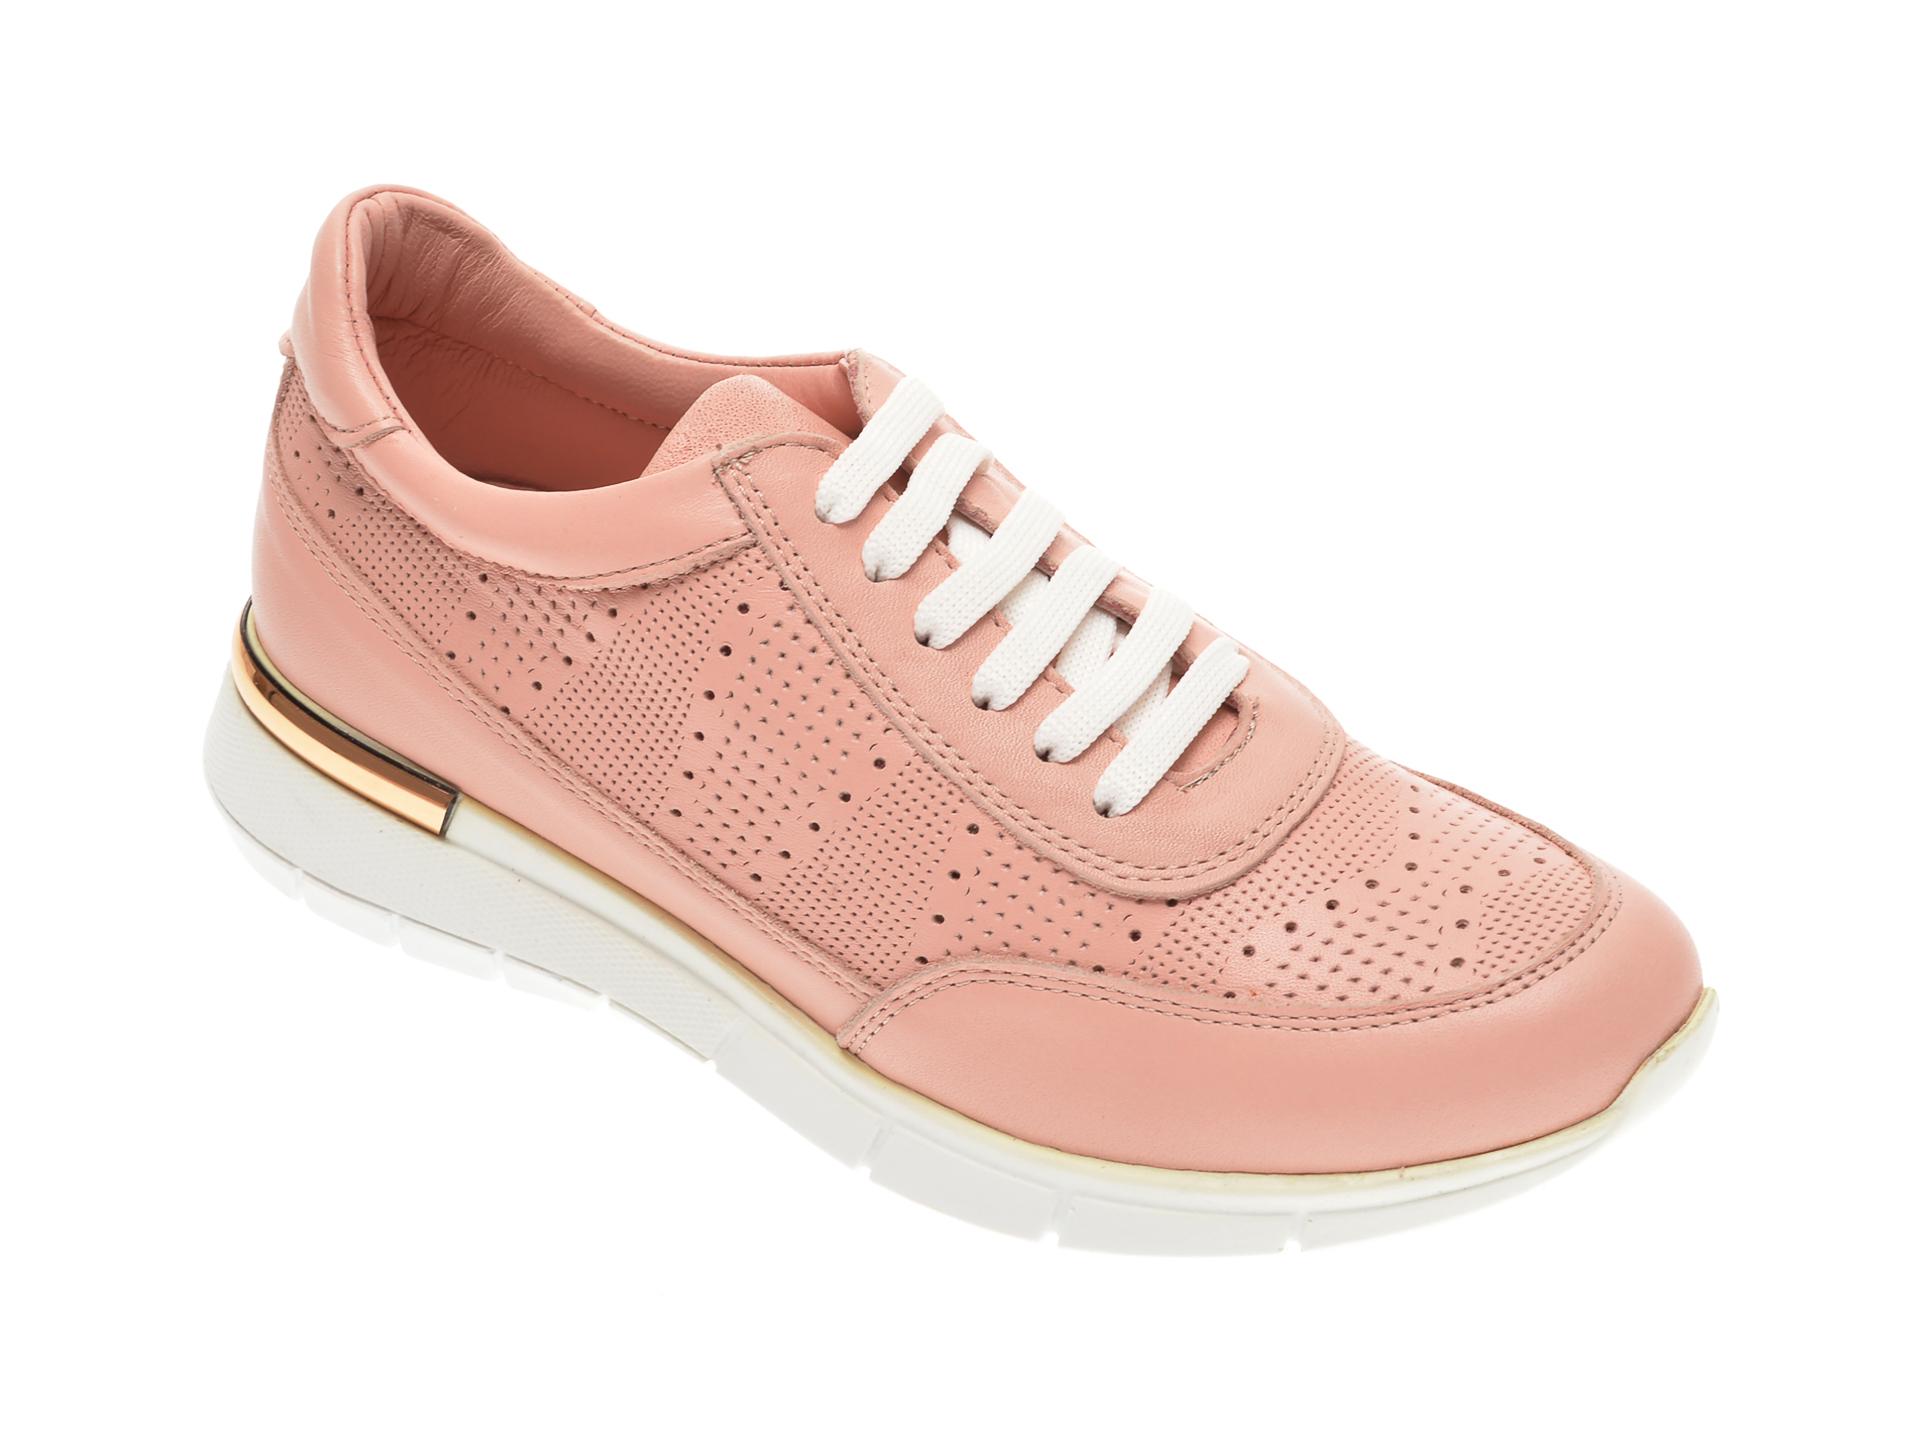 Pantofi FLAVIA PASSINI roz, 1251277, din piele naturala